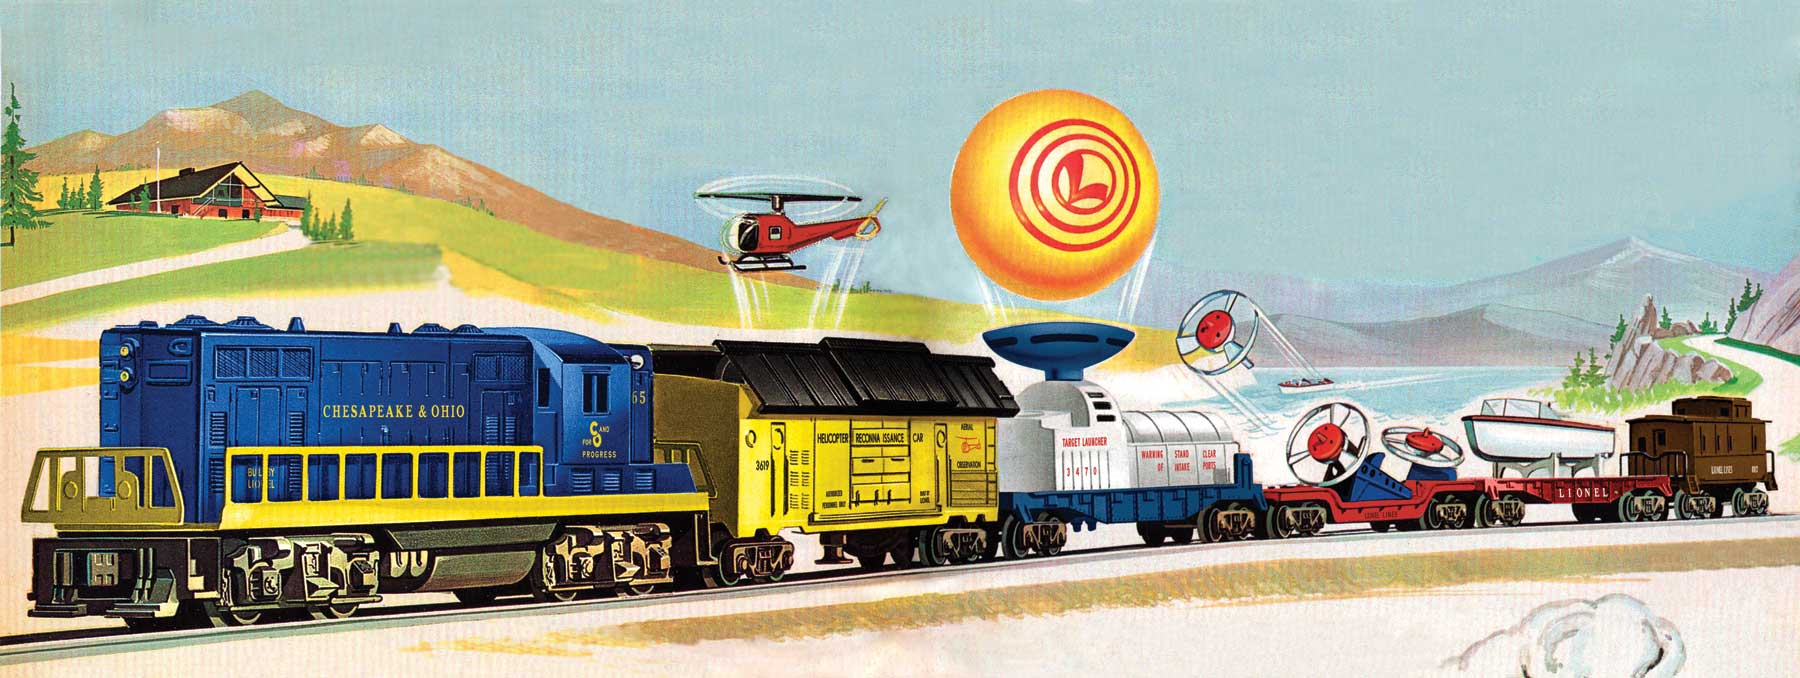 hight resolution of  11268 c o diesel freight set conv gp7 2365